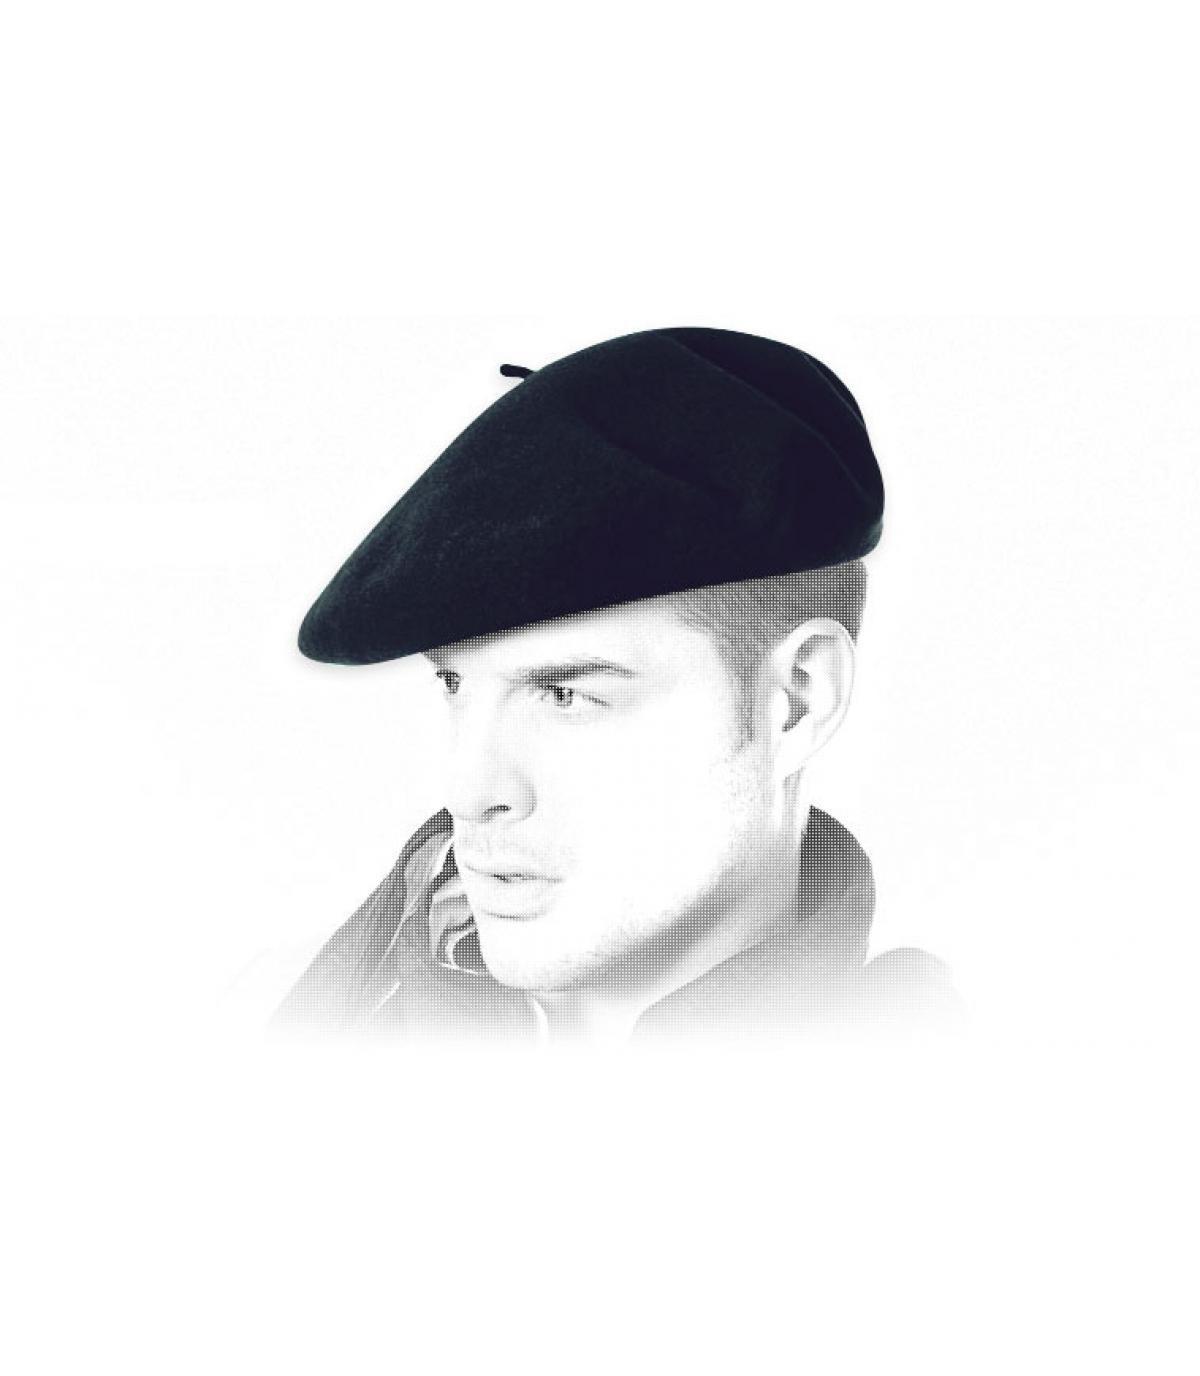 Véritable beret basque marine